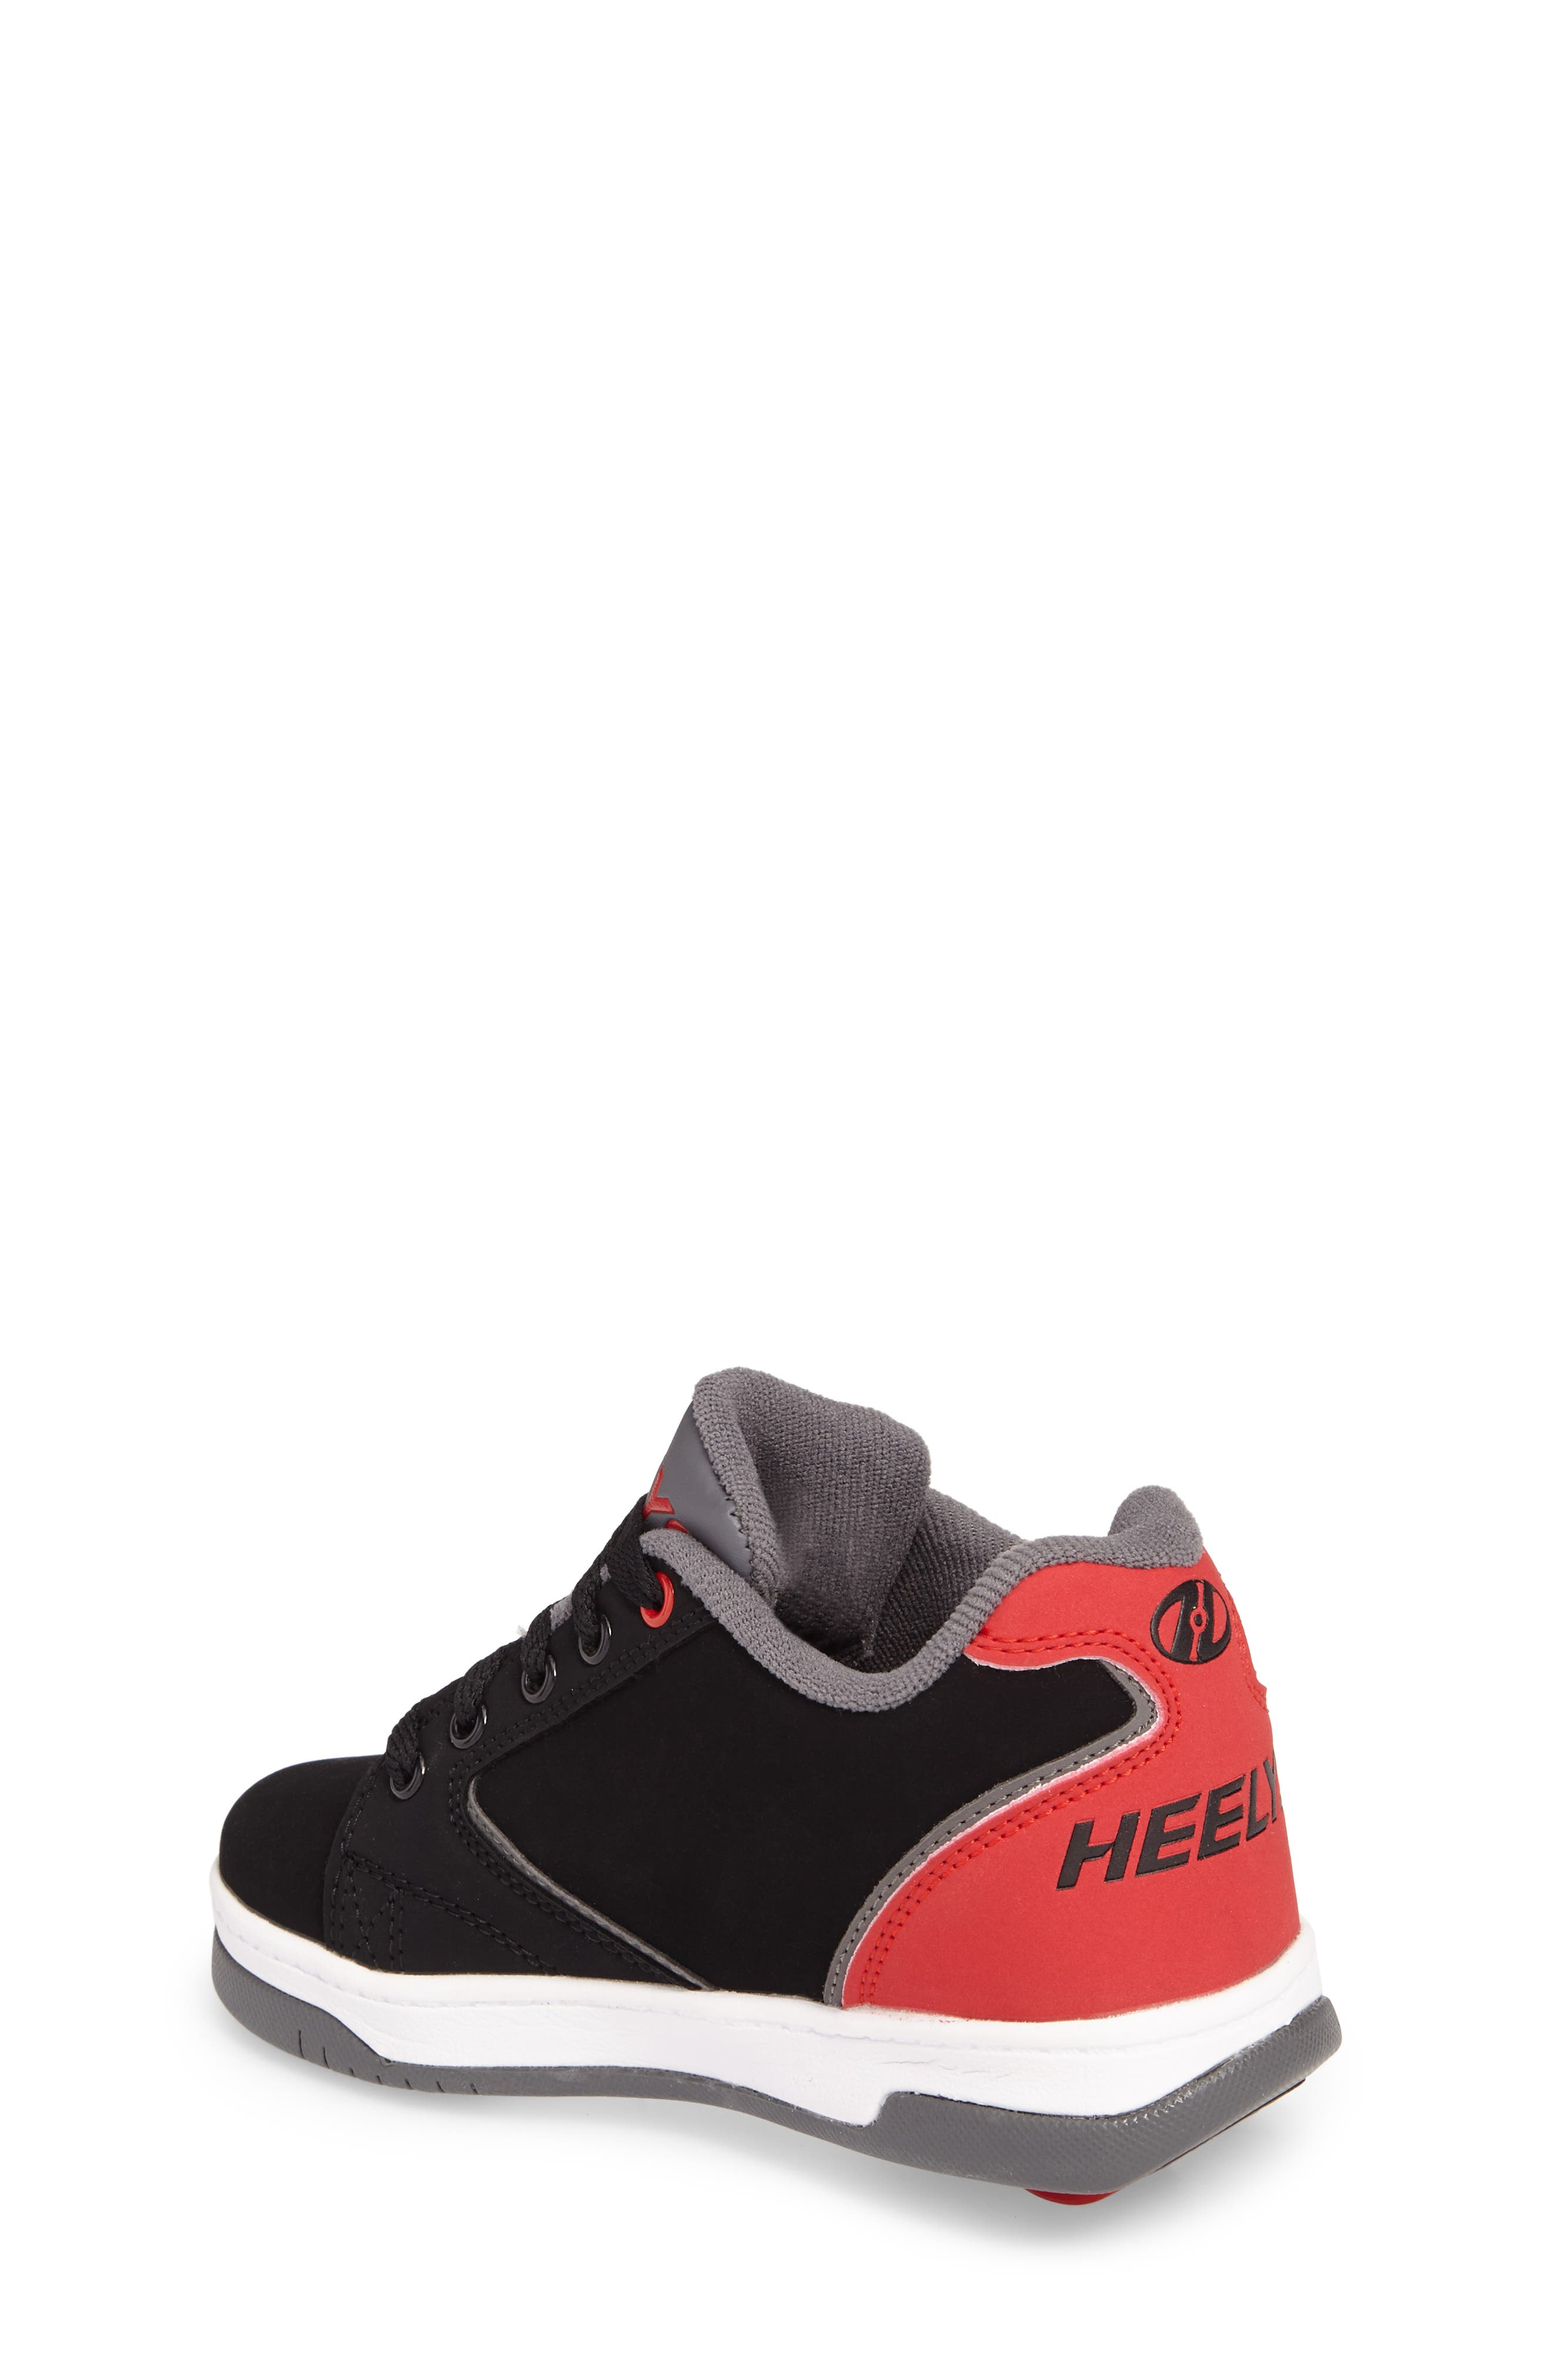 Heeleys'Propel 2.0' Sneaker,                             Alternate thumbnail 2, color,                             Black/ Red/ Grey